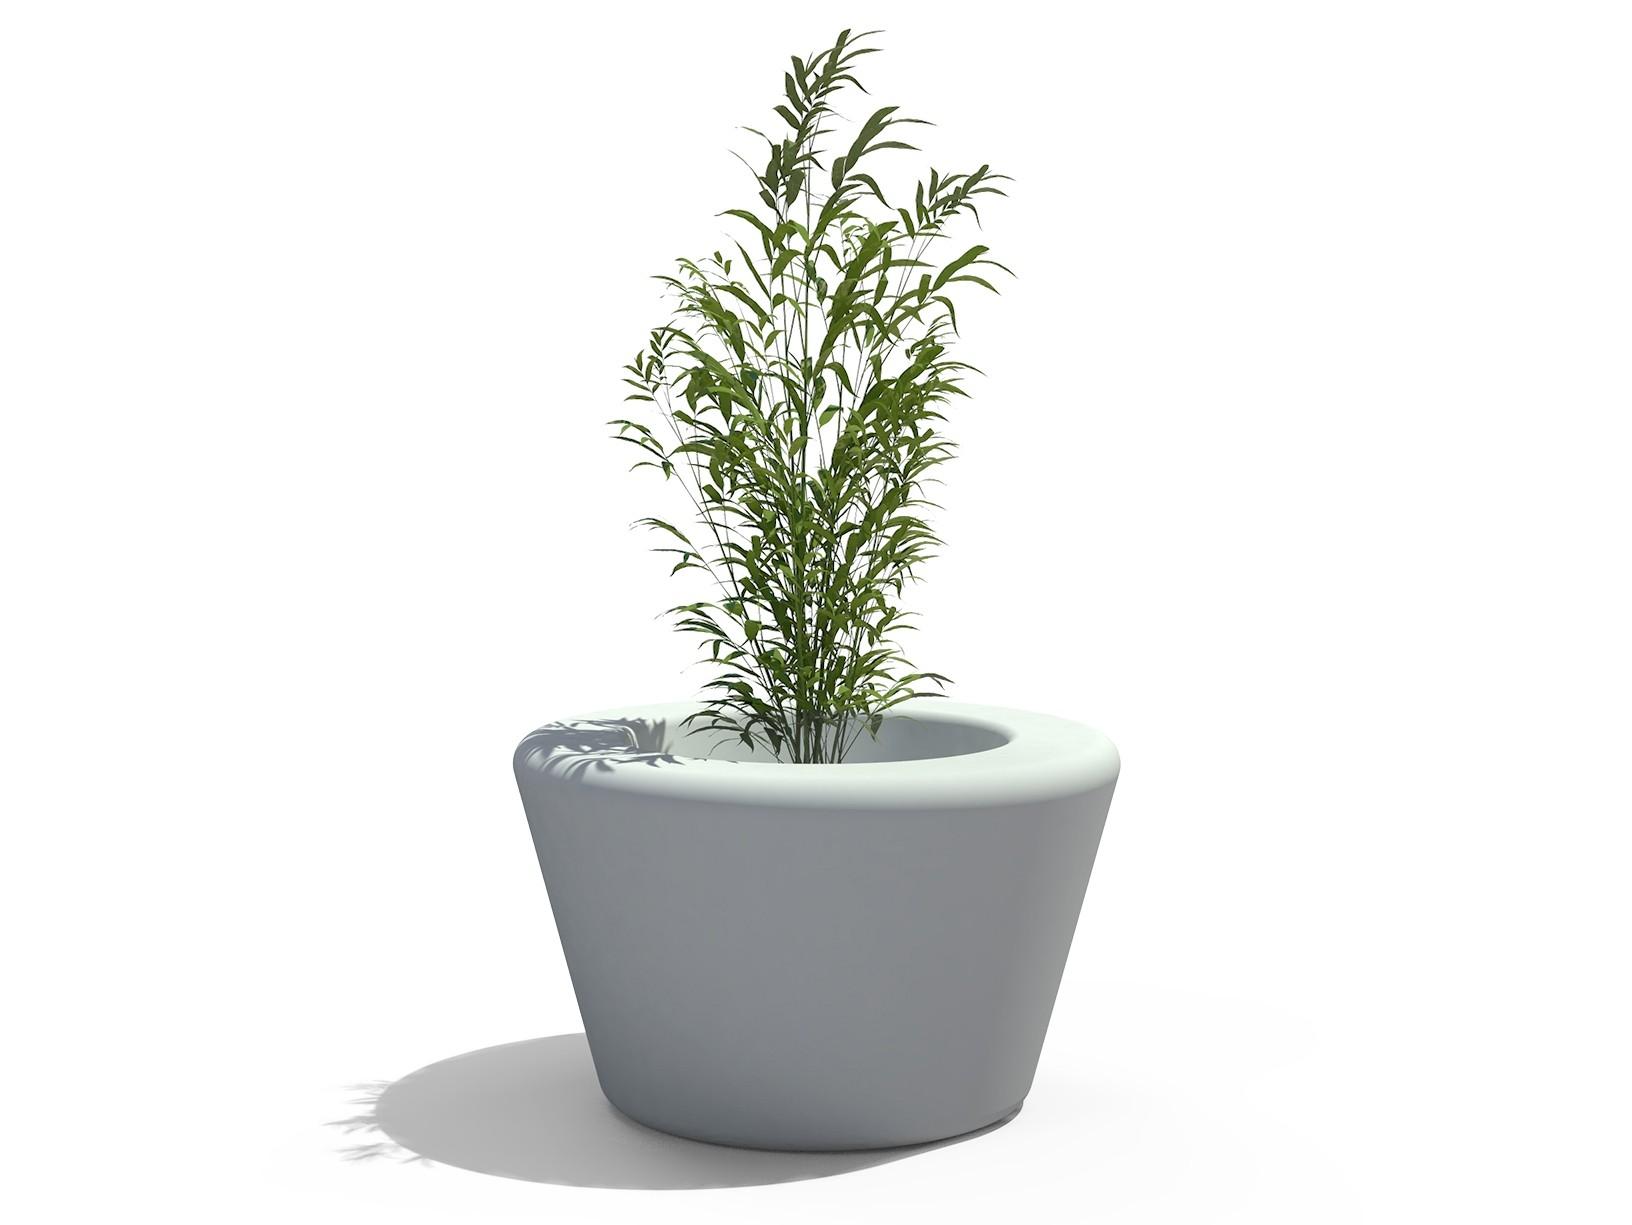 Loop cone plantenbak wit